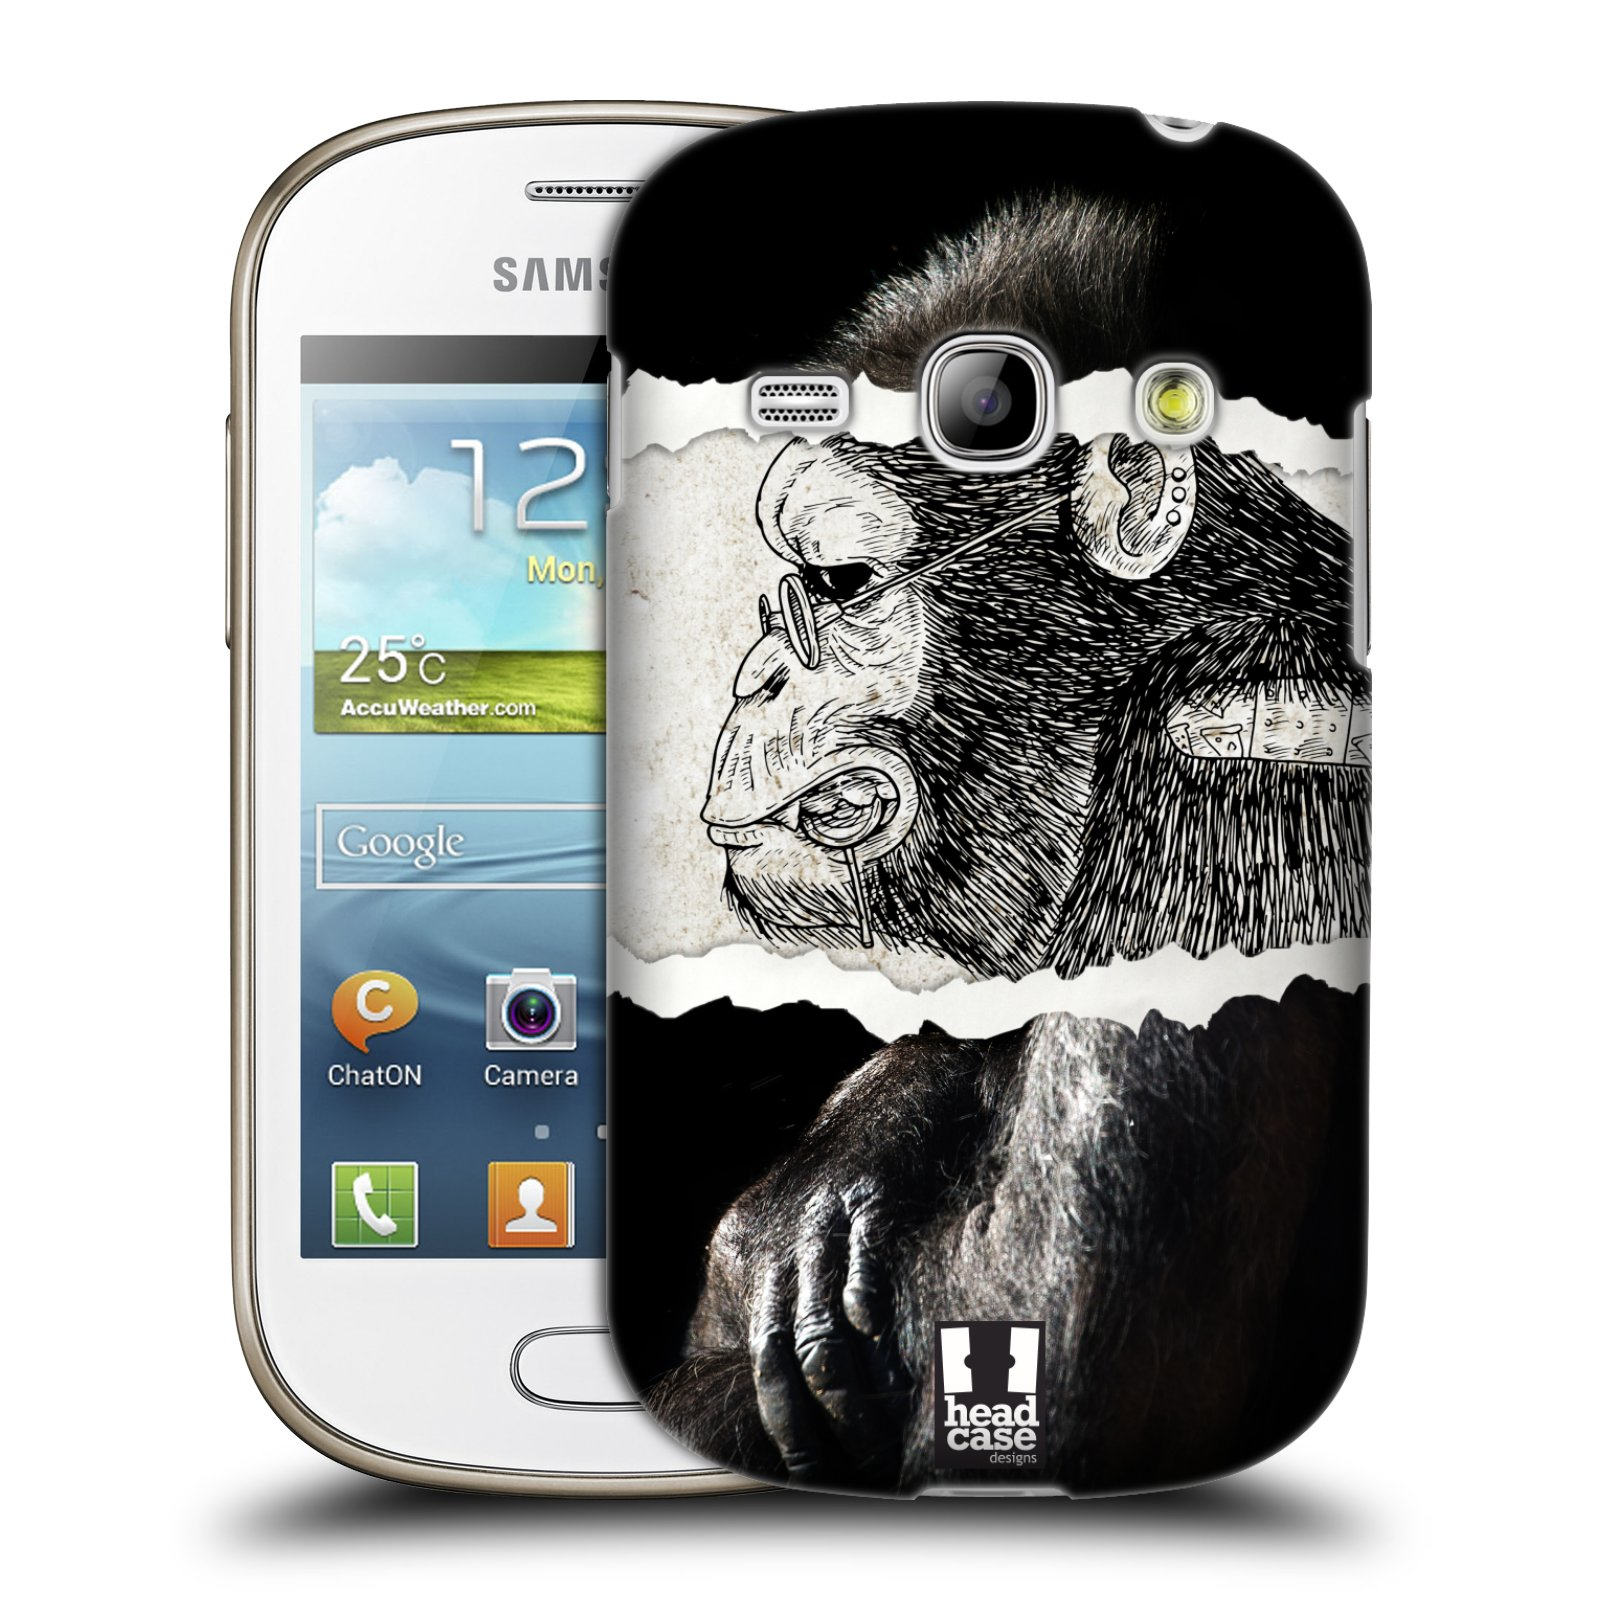 HEAD CASE plastový obal na mobil SAMSUNG GALAXY FAME (S6810) vzor zvířata koláž opice